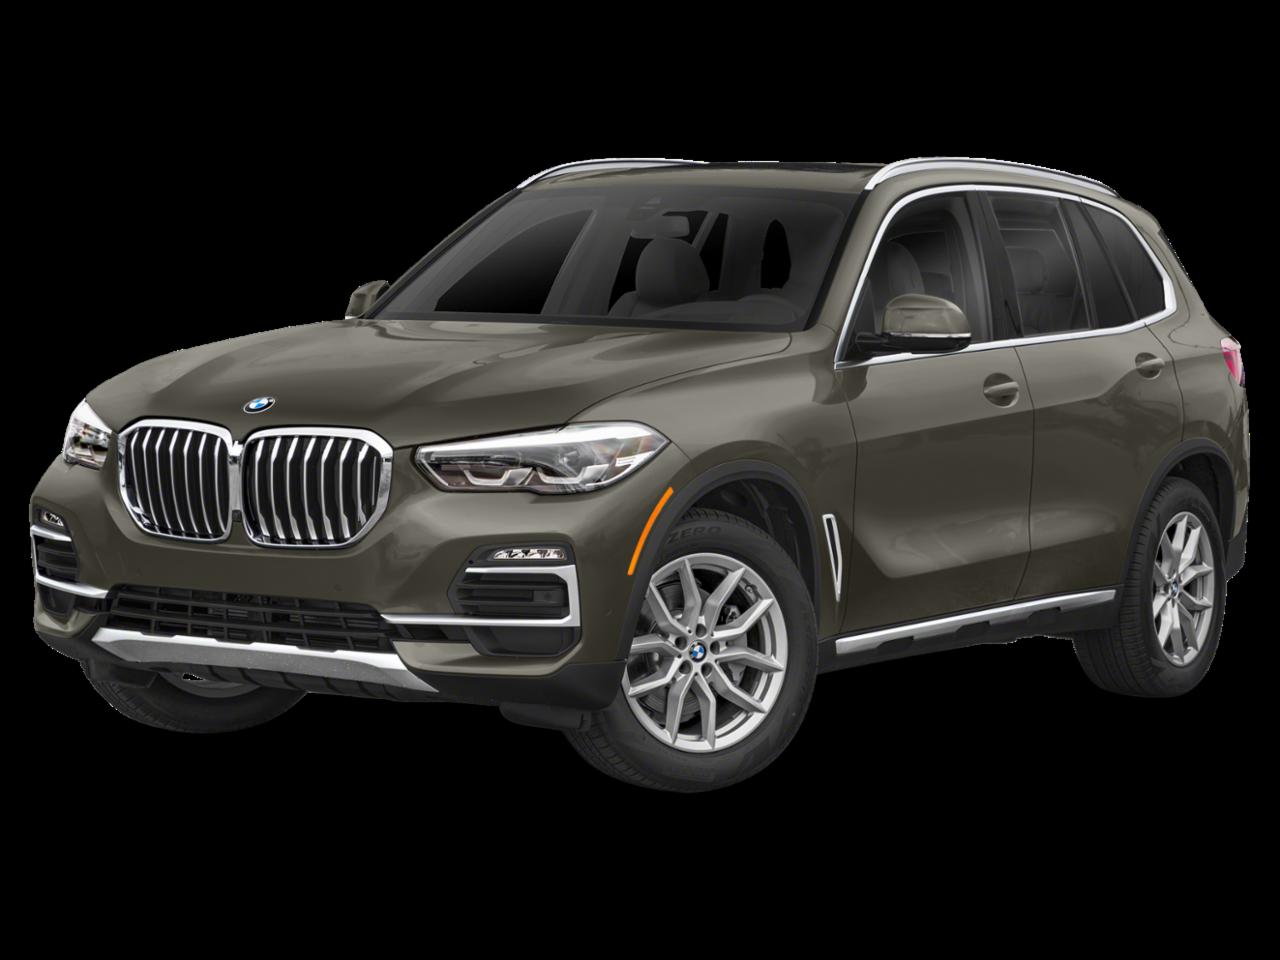 BMW 2020 X5 xDrive50i Sports Activity Vehicle